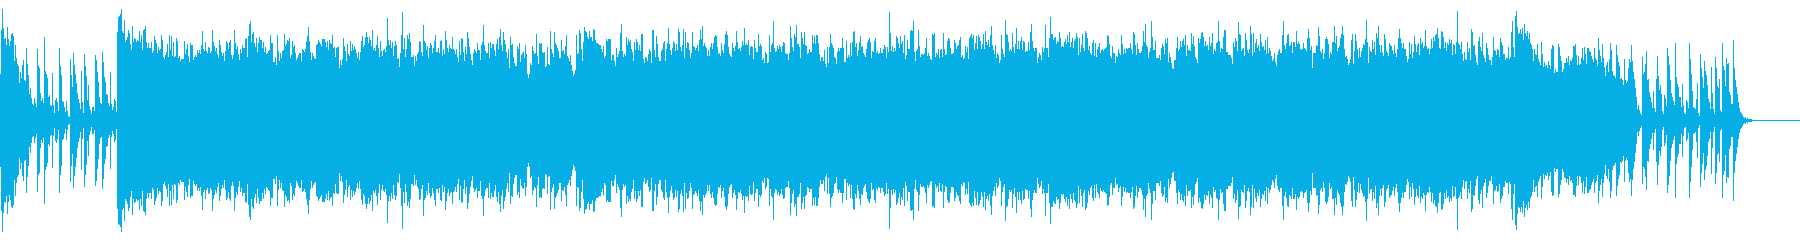 POPなギターロックの再生済みの波形